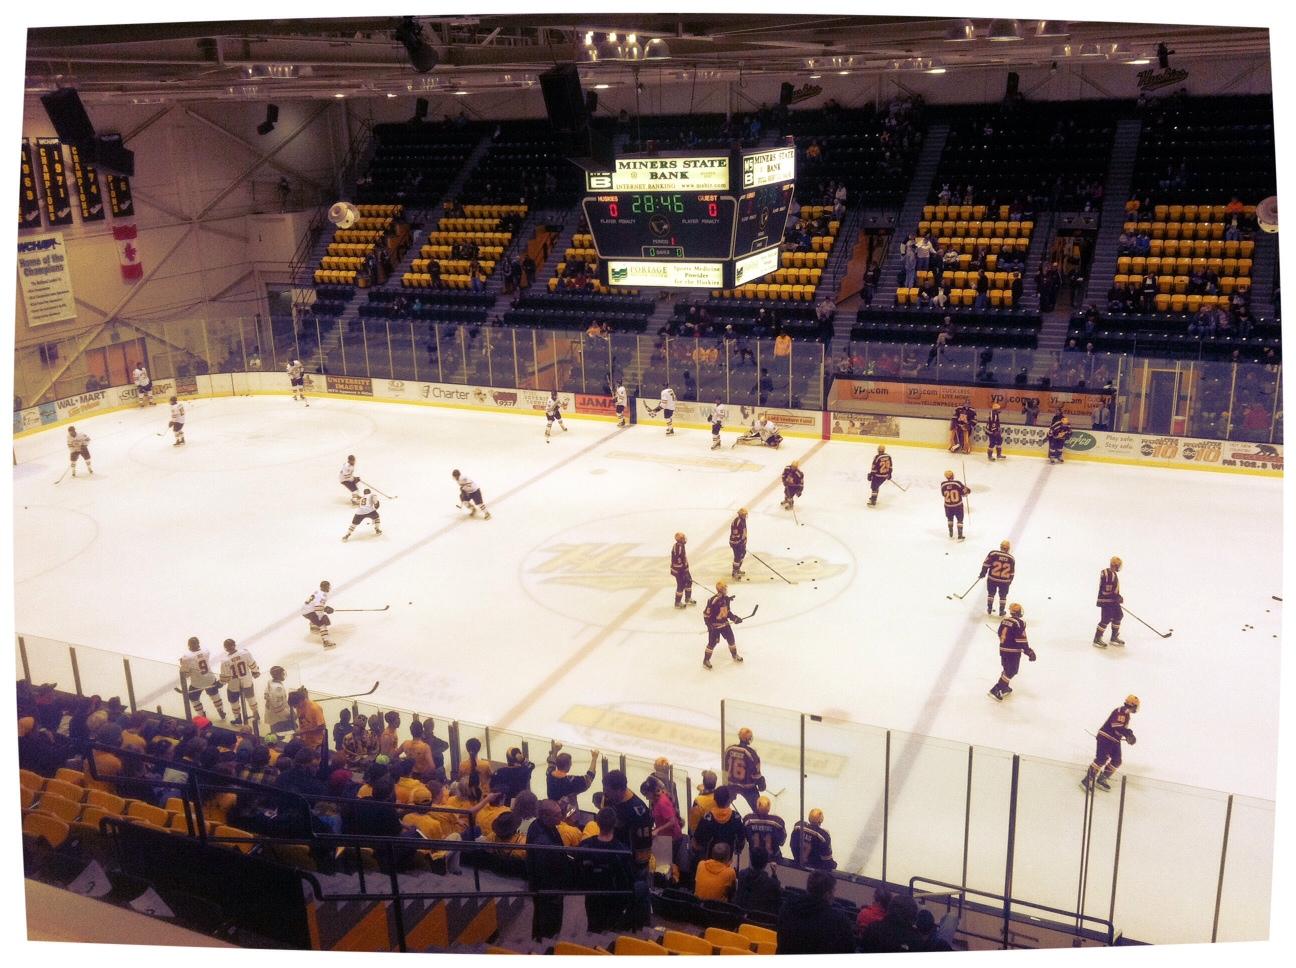 LIVE at John MacInnes Student Ice Arena!